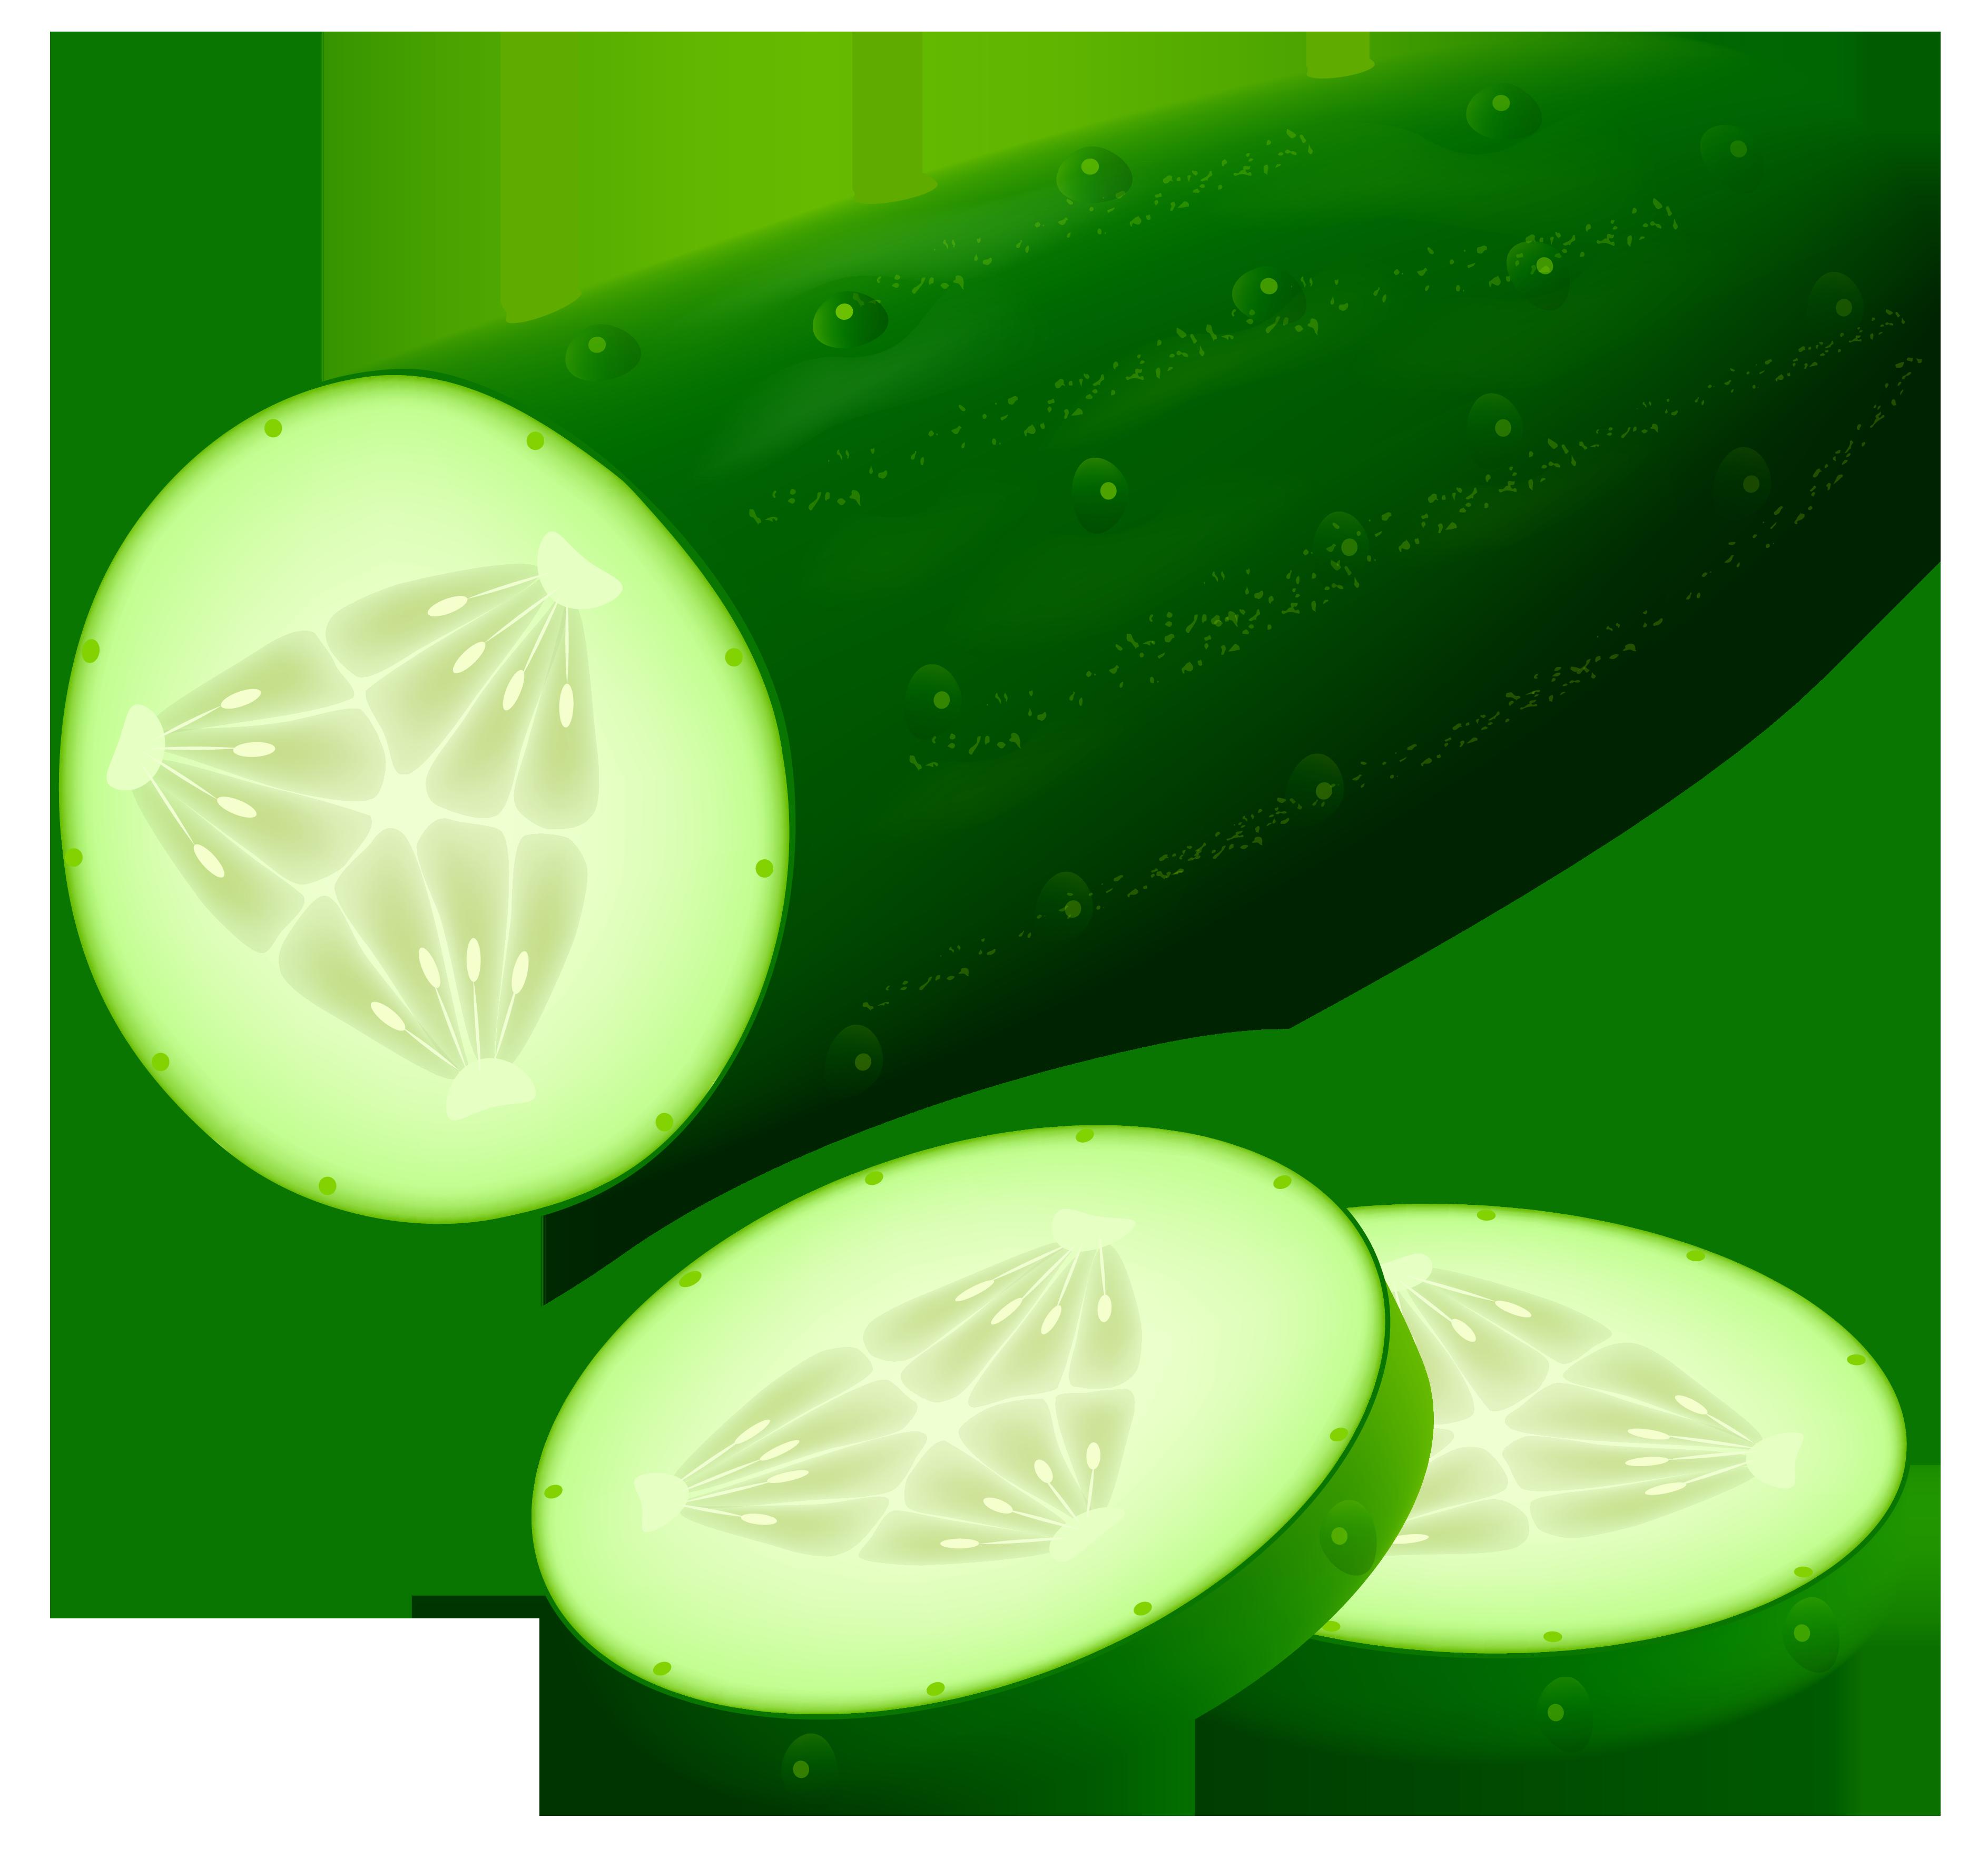 Cucumber Clipart & Cucumber Clip Art Images.